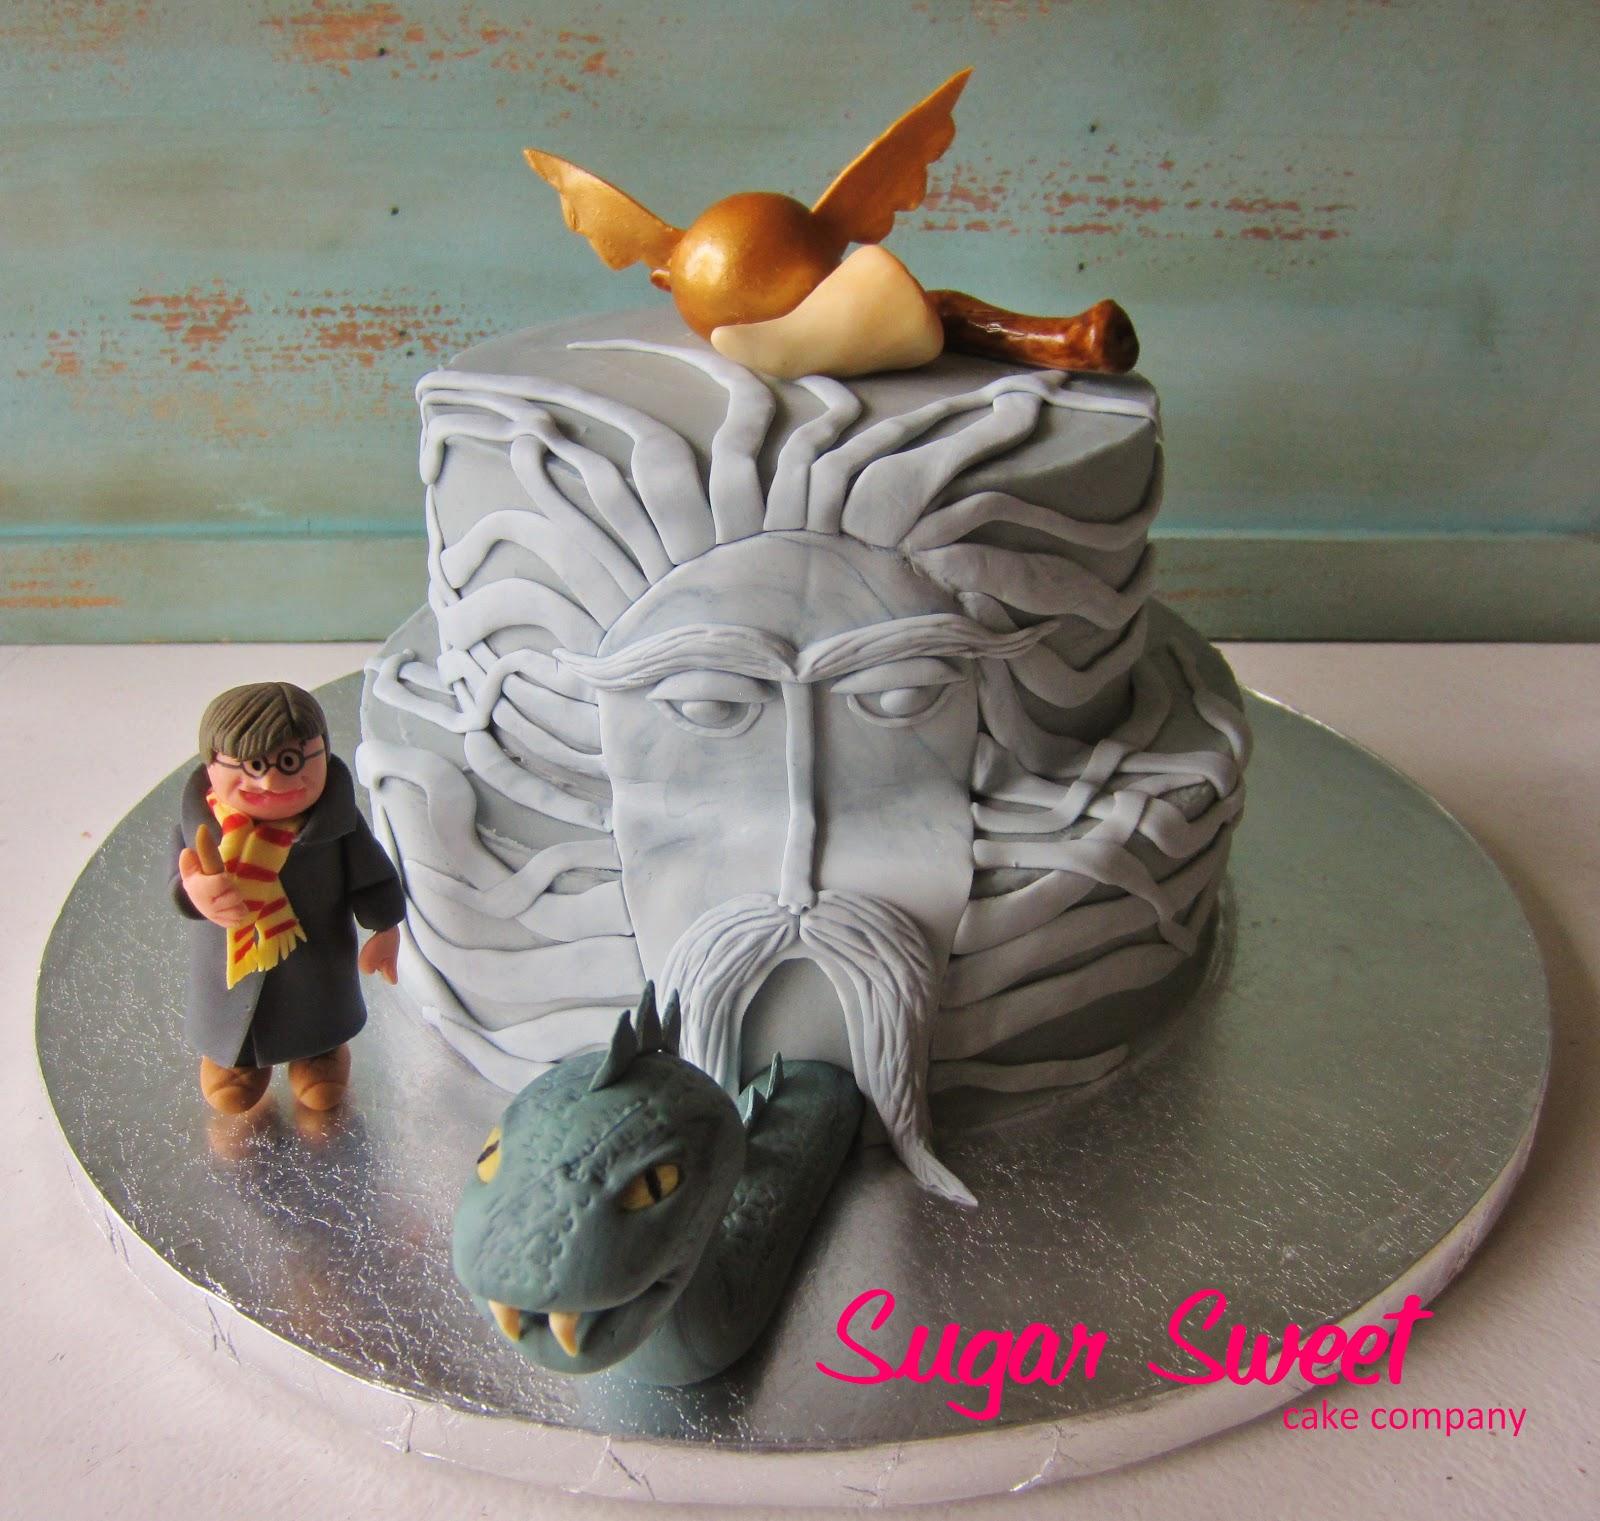 Sugar Sweet Cake Company